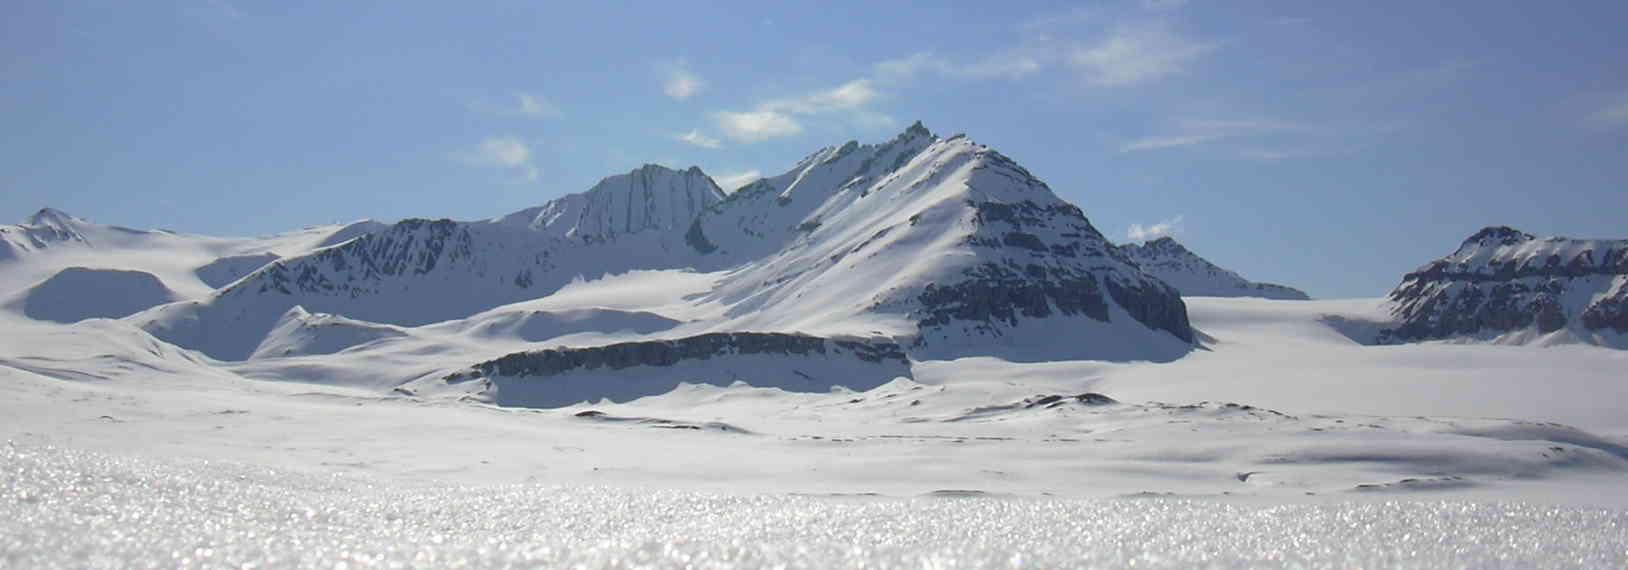 icefog.org Svalbard, Summer 2007